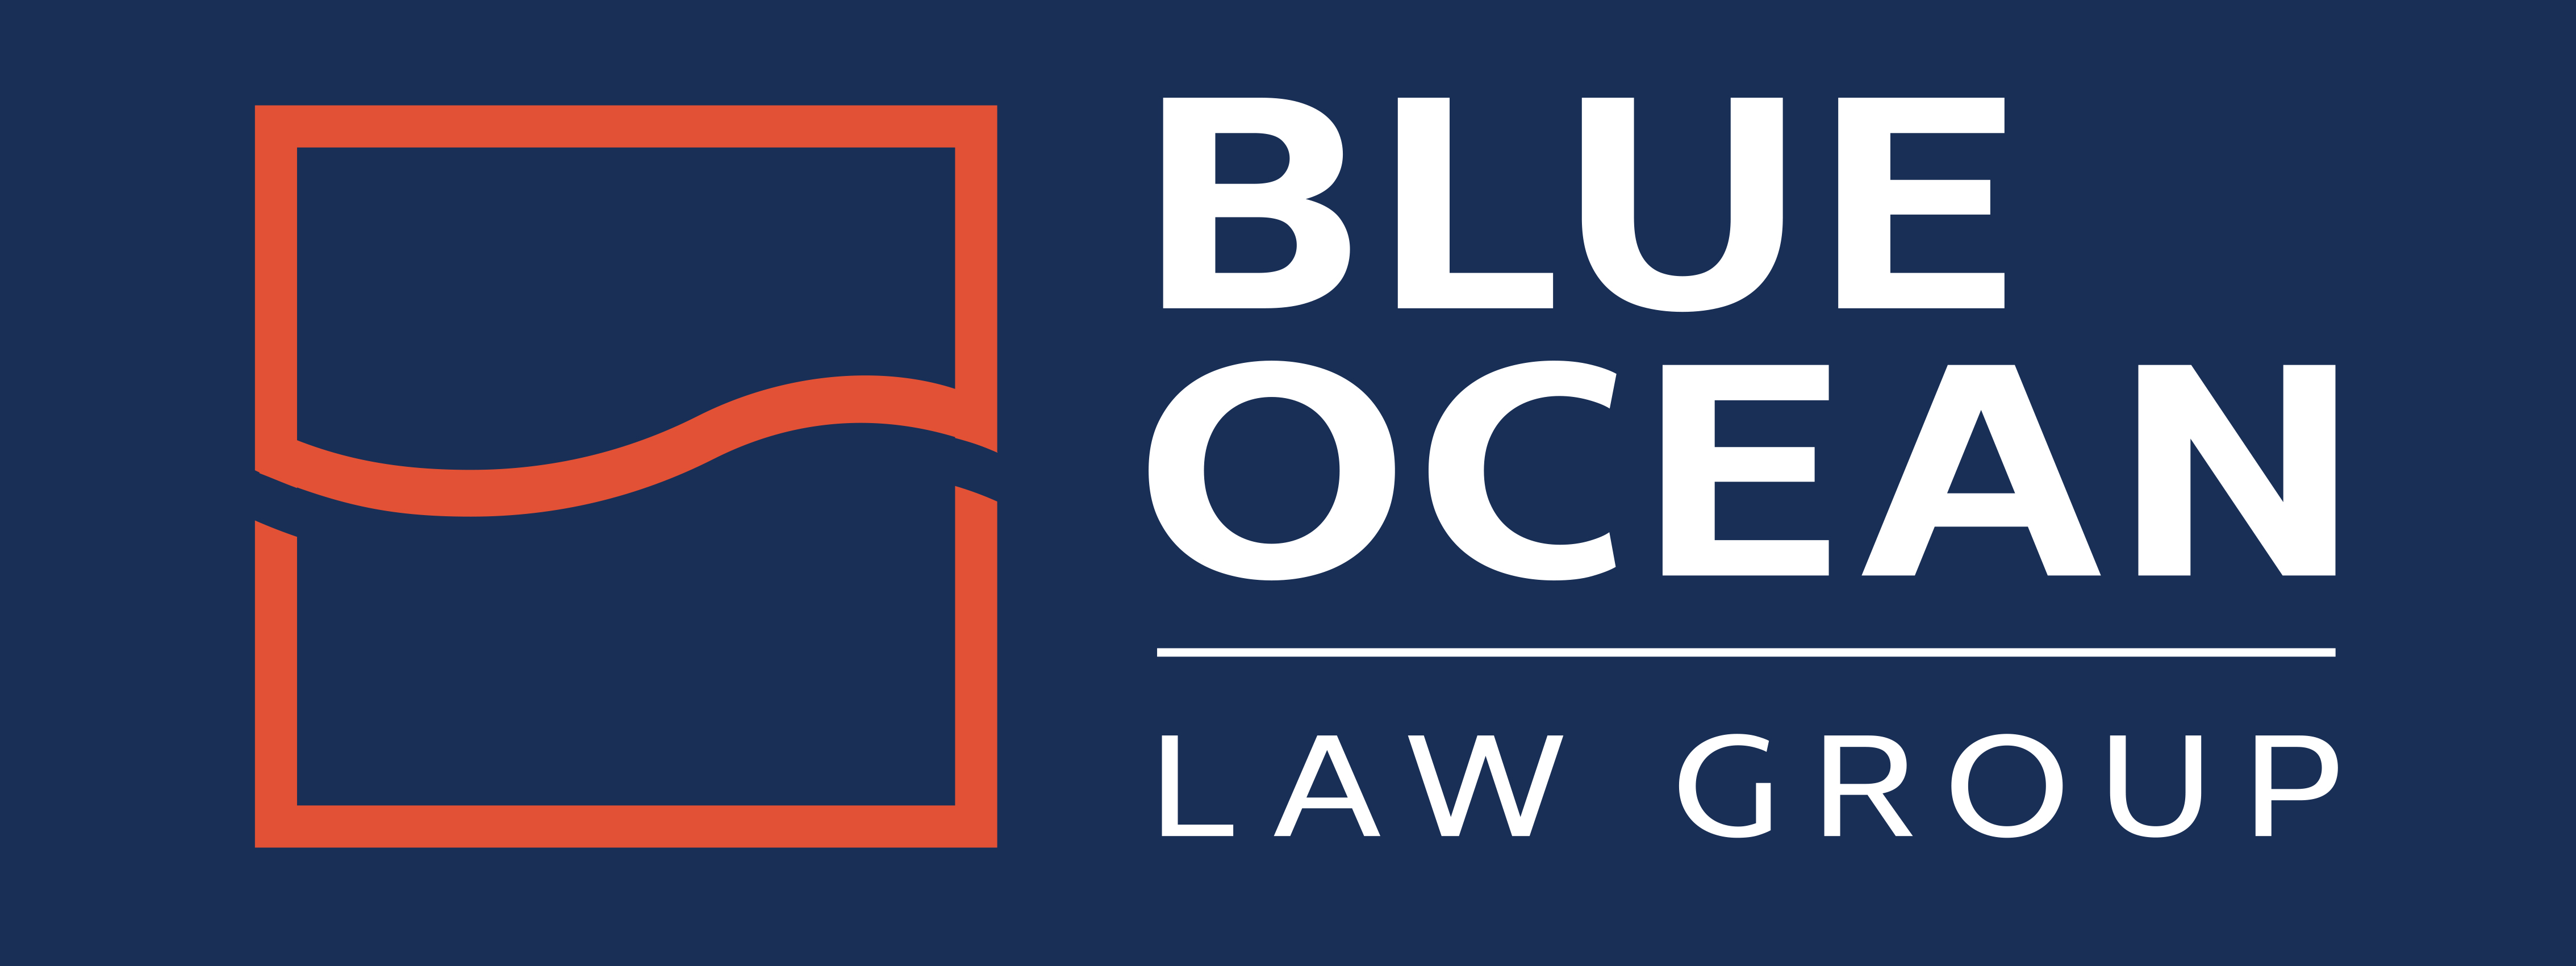 Blue Ocean Law Group Sydney